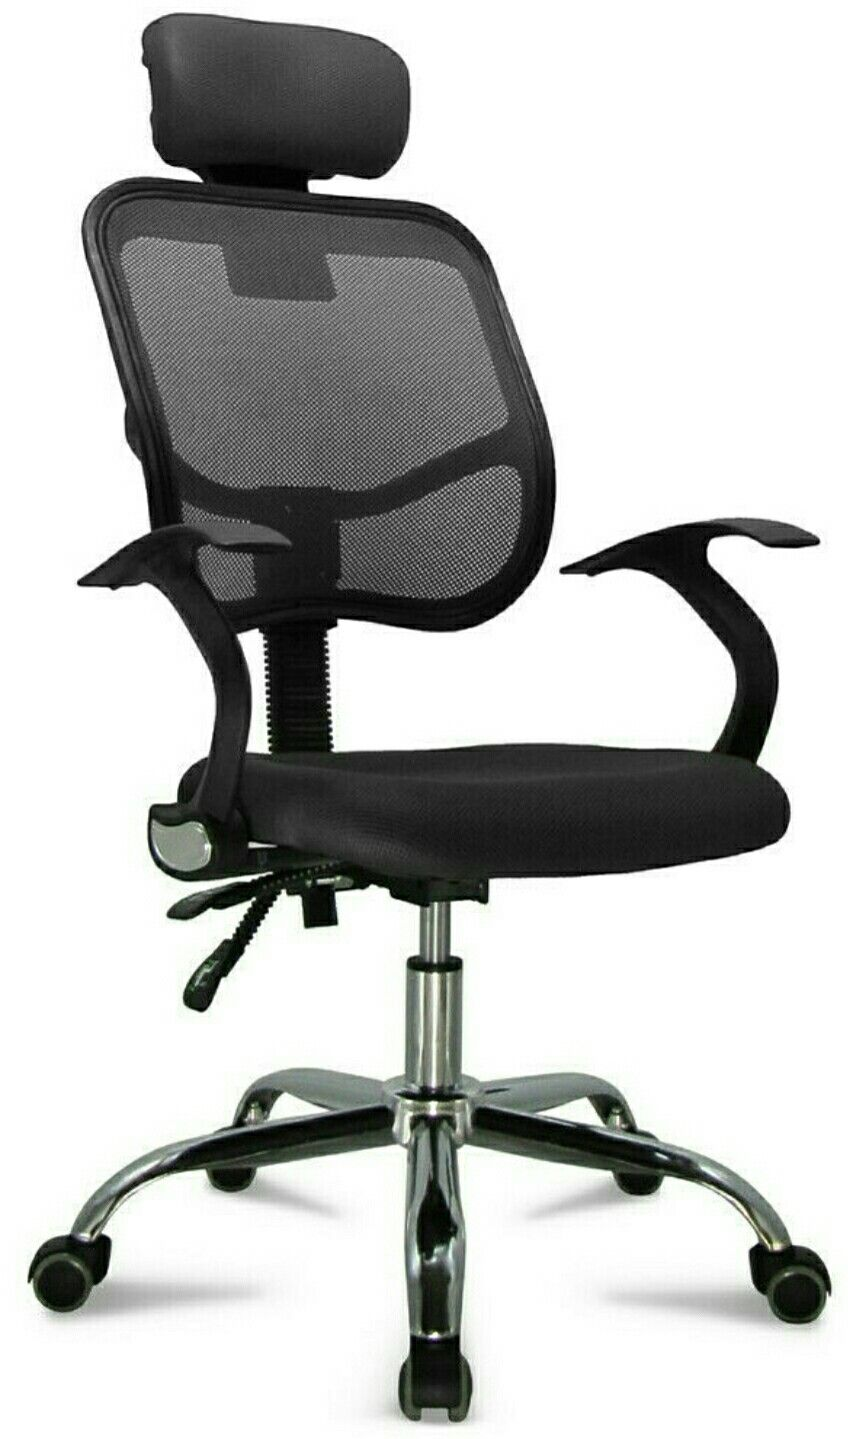 Details About Ergonomic Mesh Office Chair Adjustable Swivel